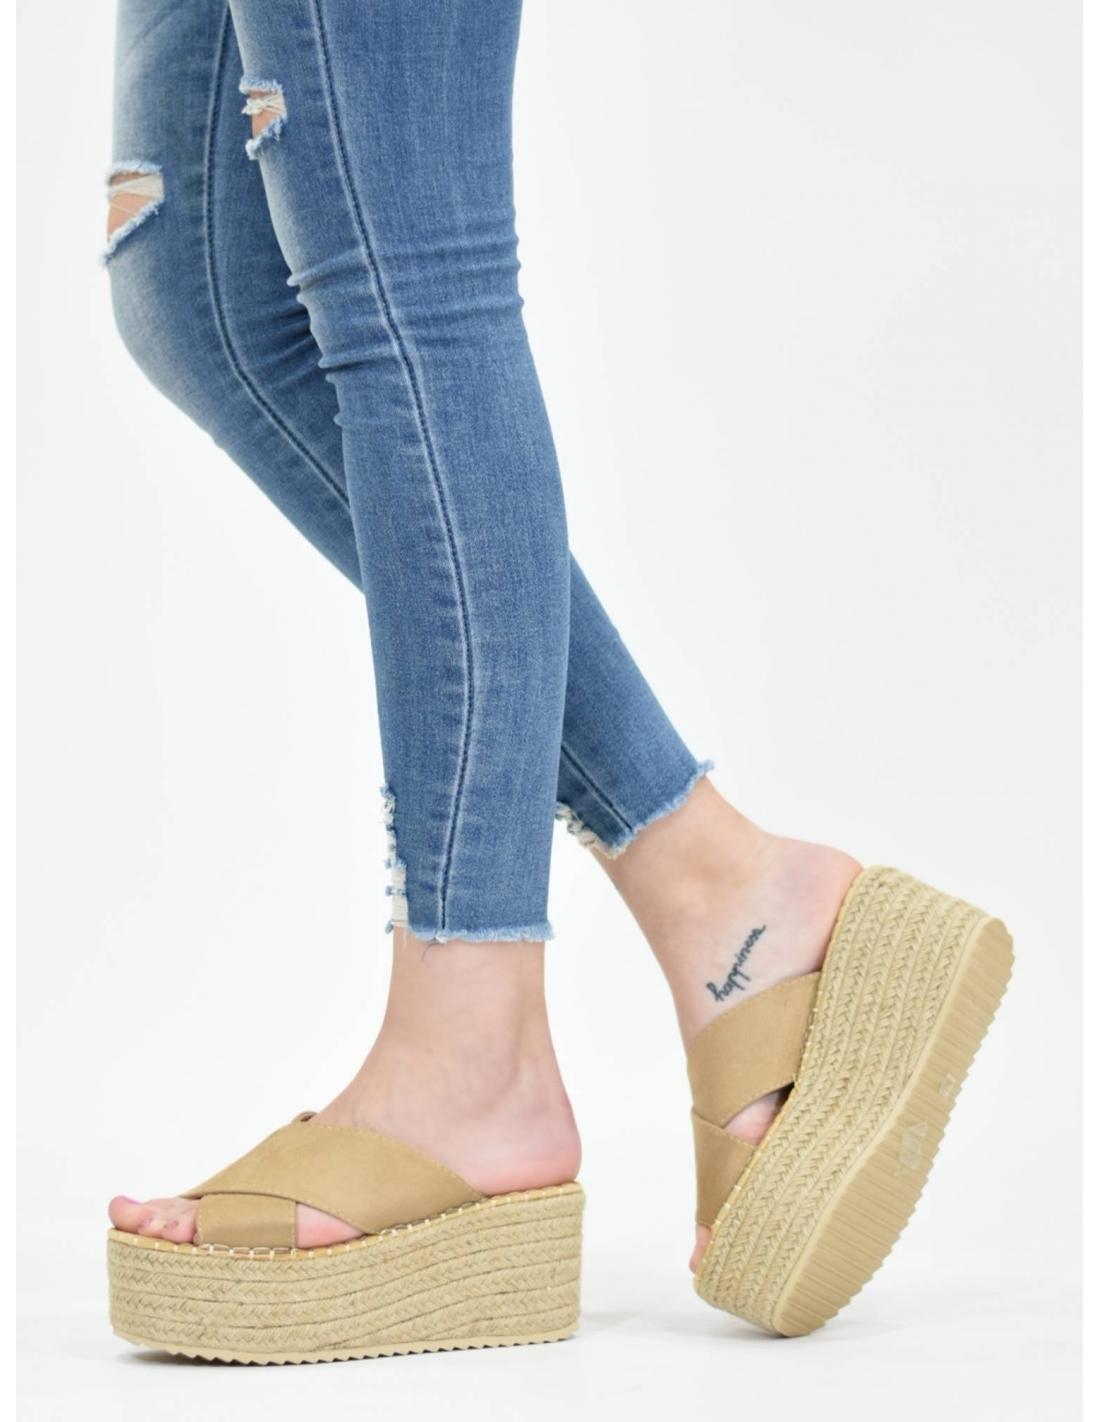 Sandalia cintas cruzadas beige